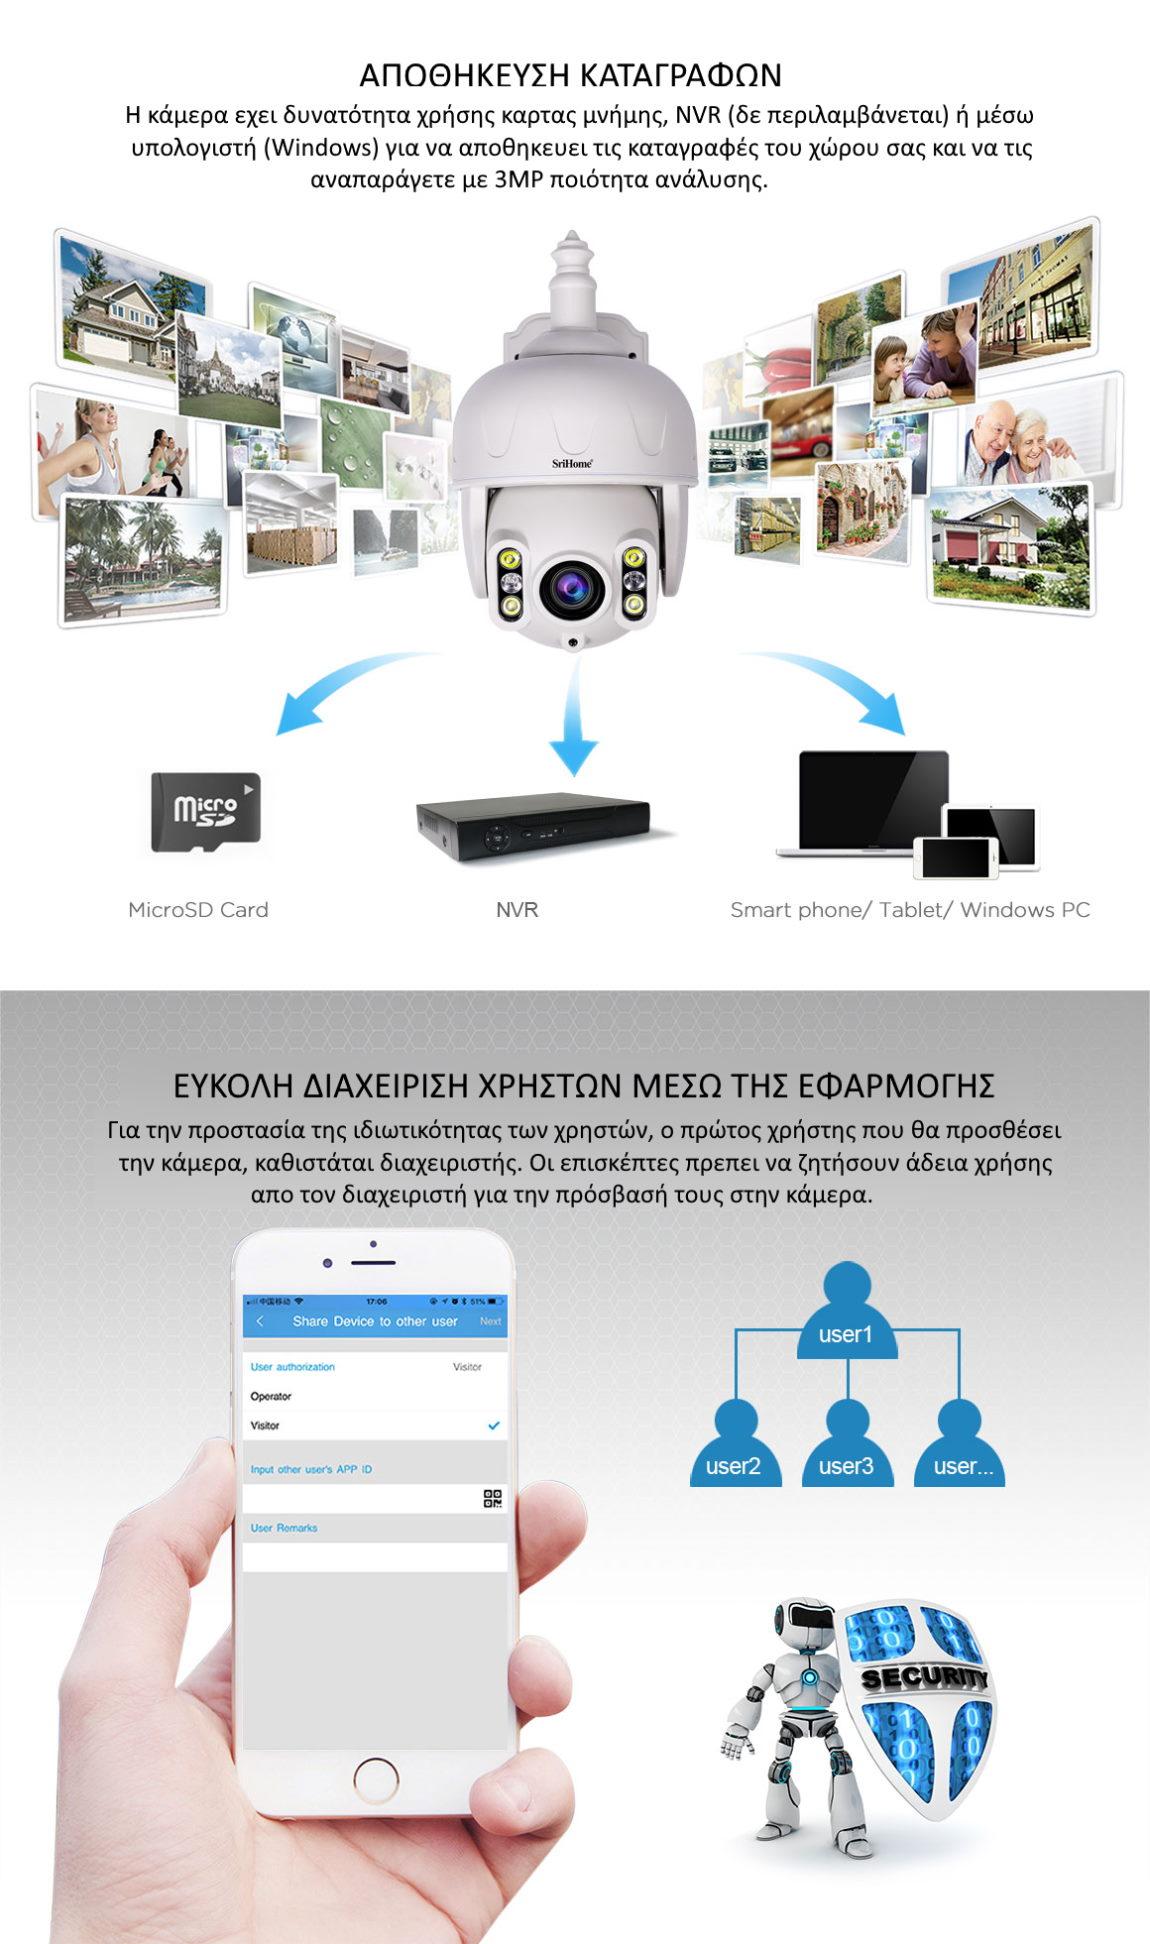 Srihome SH028 Κάμερα Ασφαλείας διαχείριση μέσω εφαρμογής